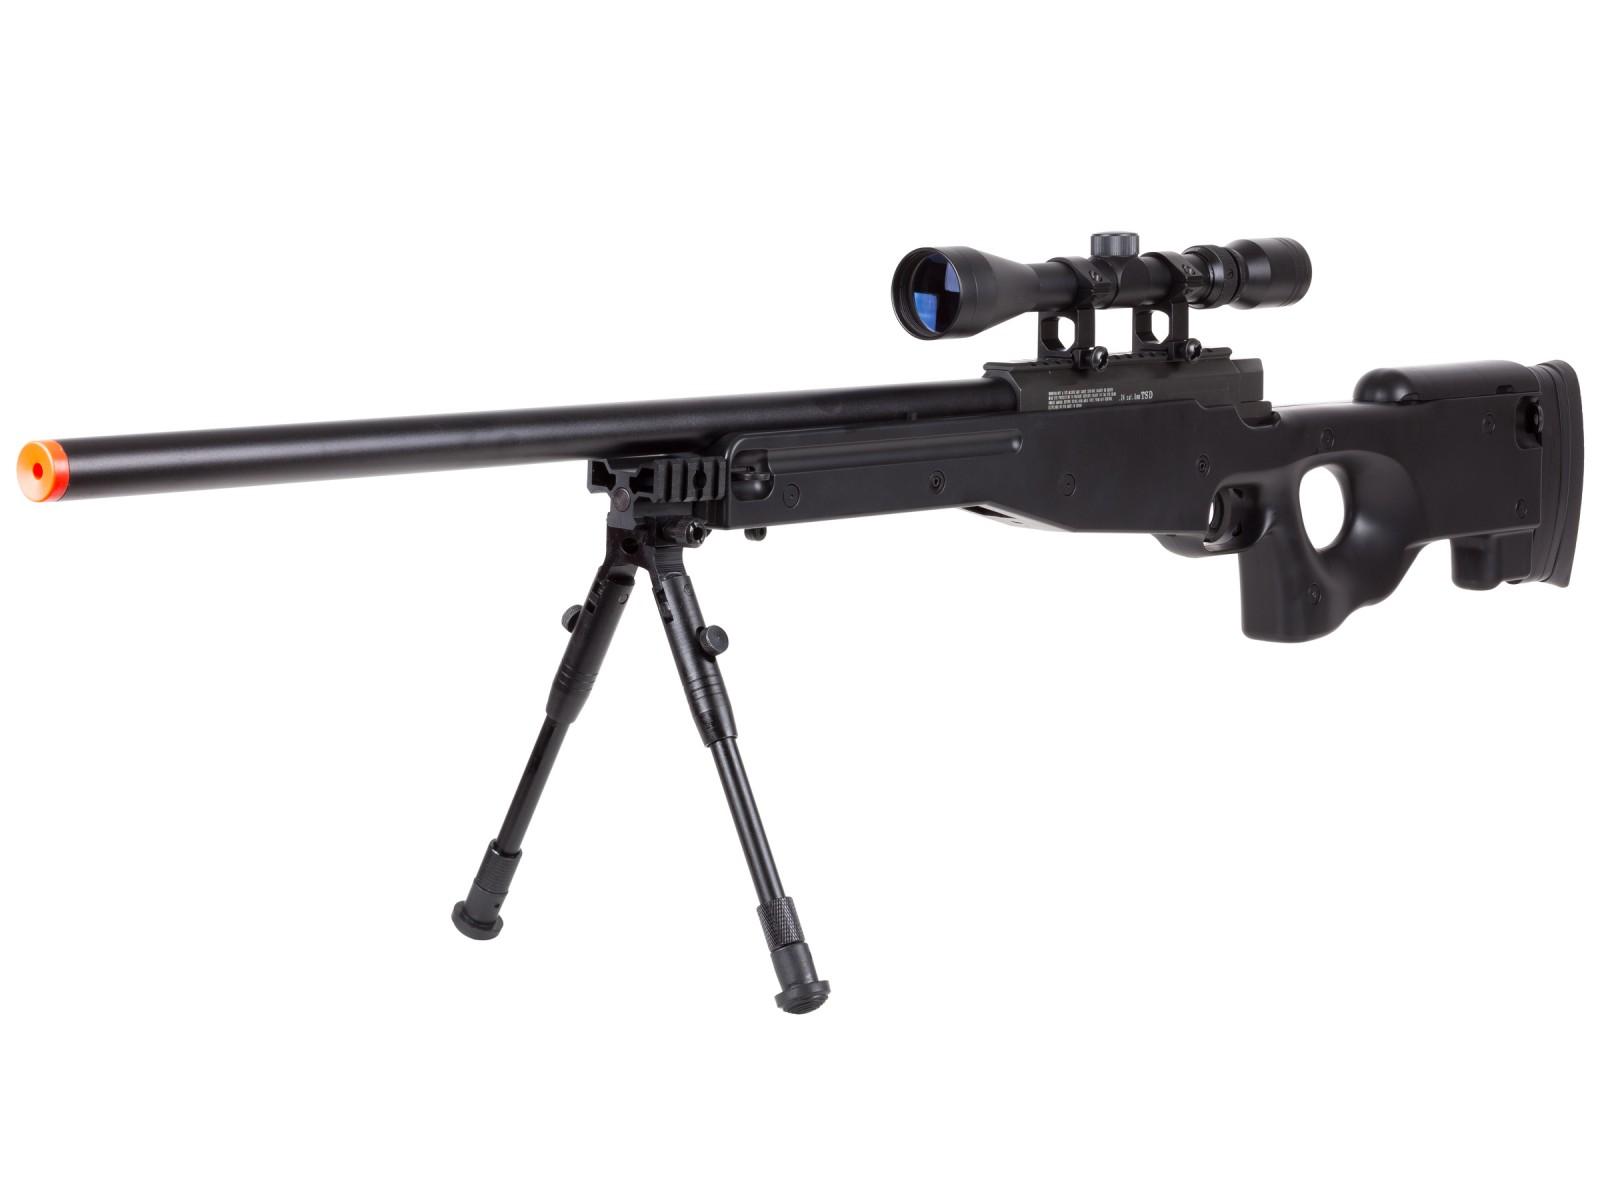 TSD_Tactical_Series_Type_96_Sniper_Black_Rifle_6mm